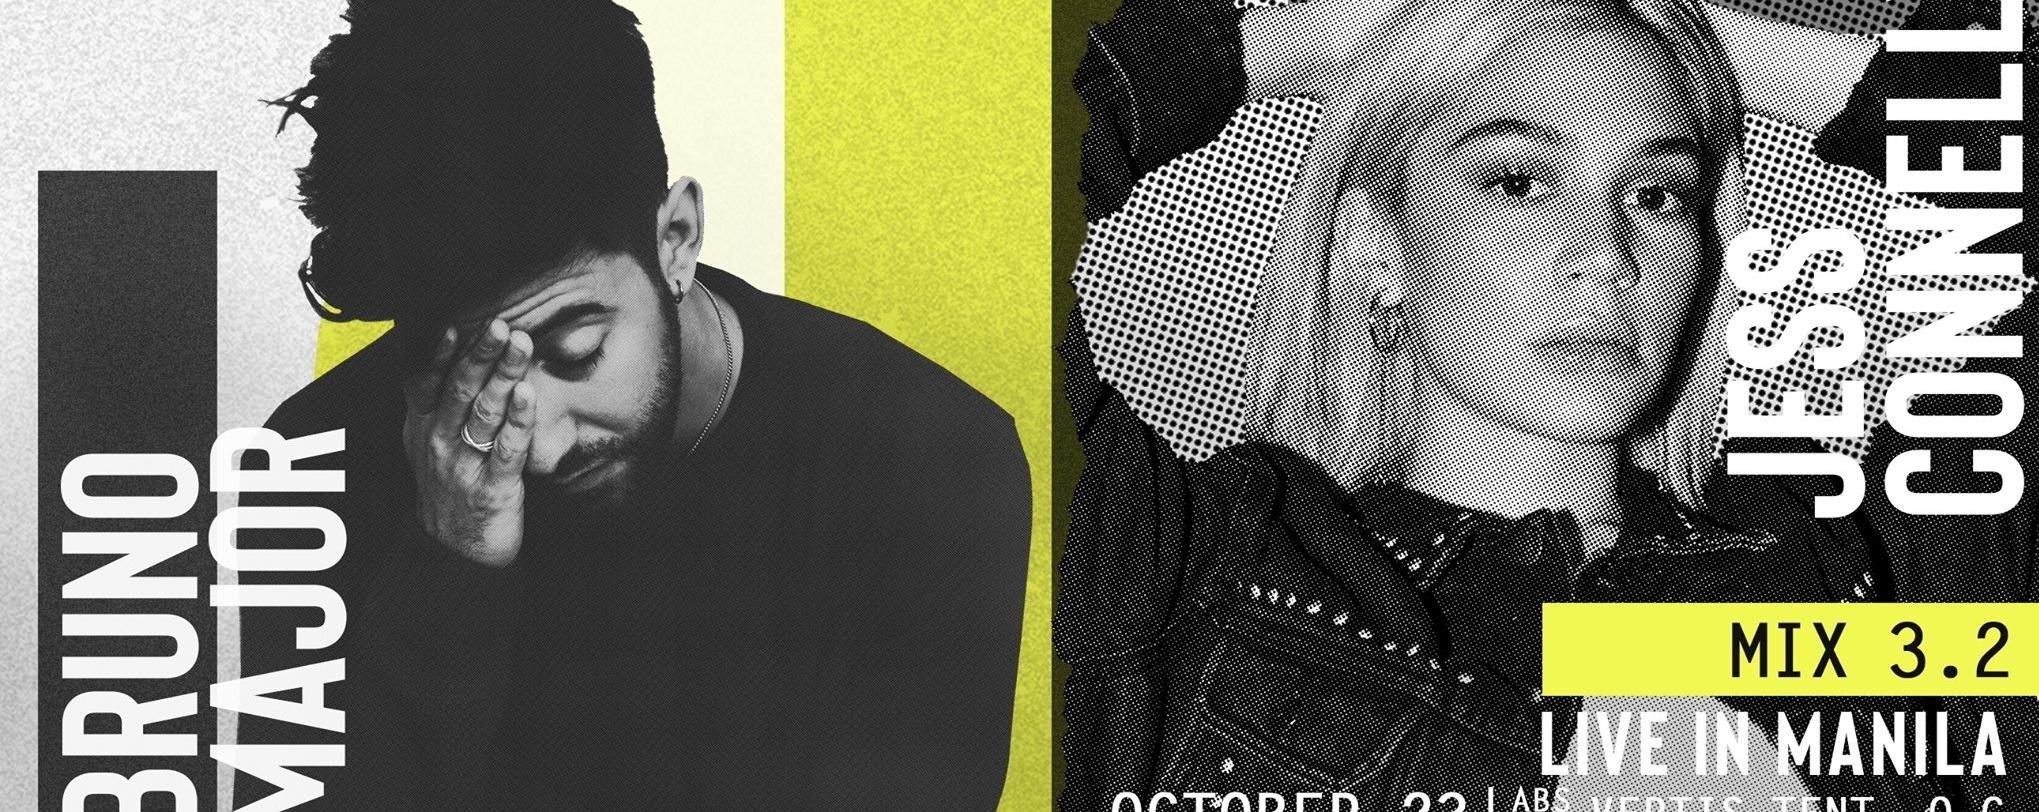 Karpos Live Mix 3.2 // Bruno Major + Jess Connelly